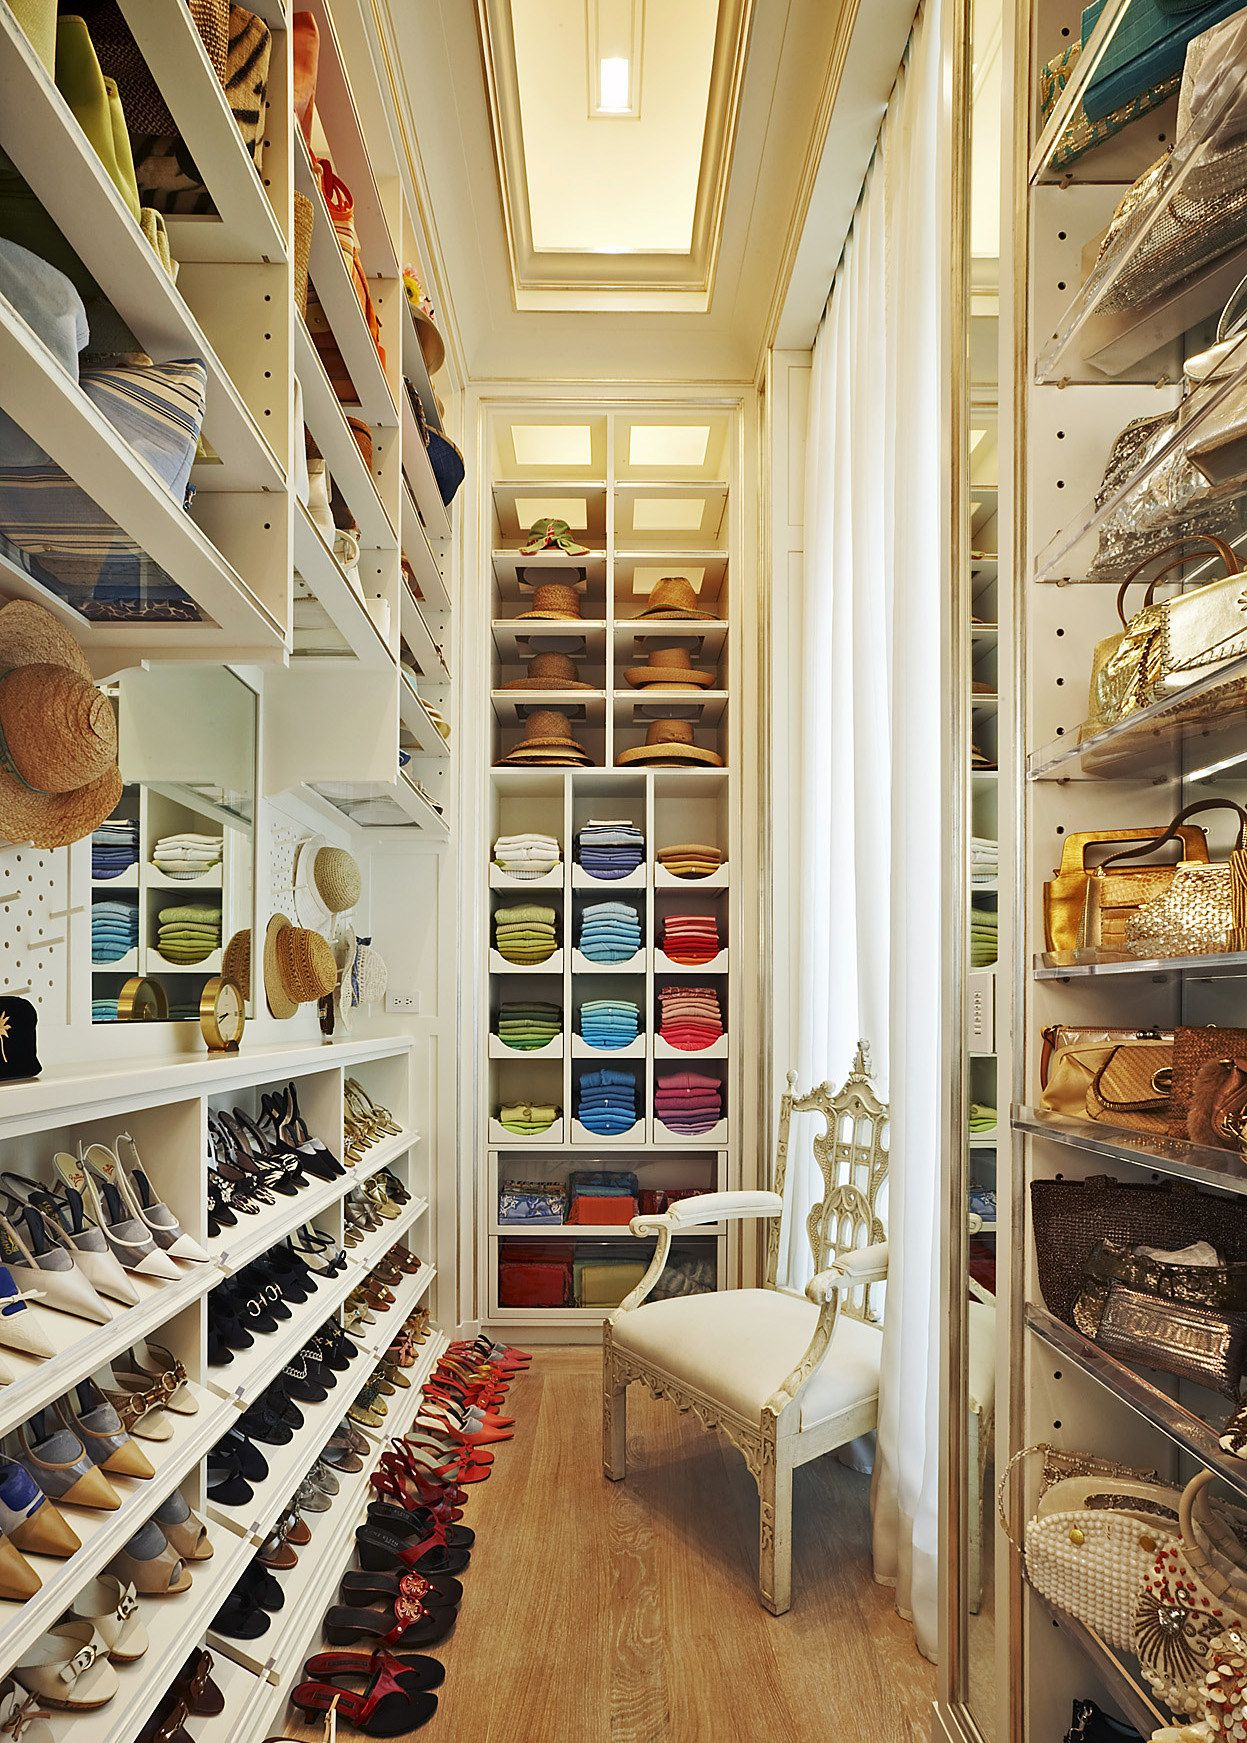 Closet organization ideas and tips by custom